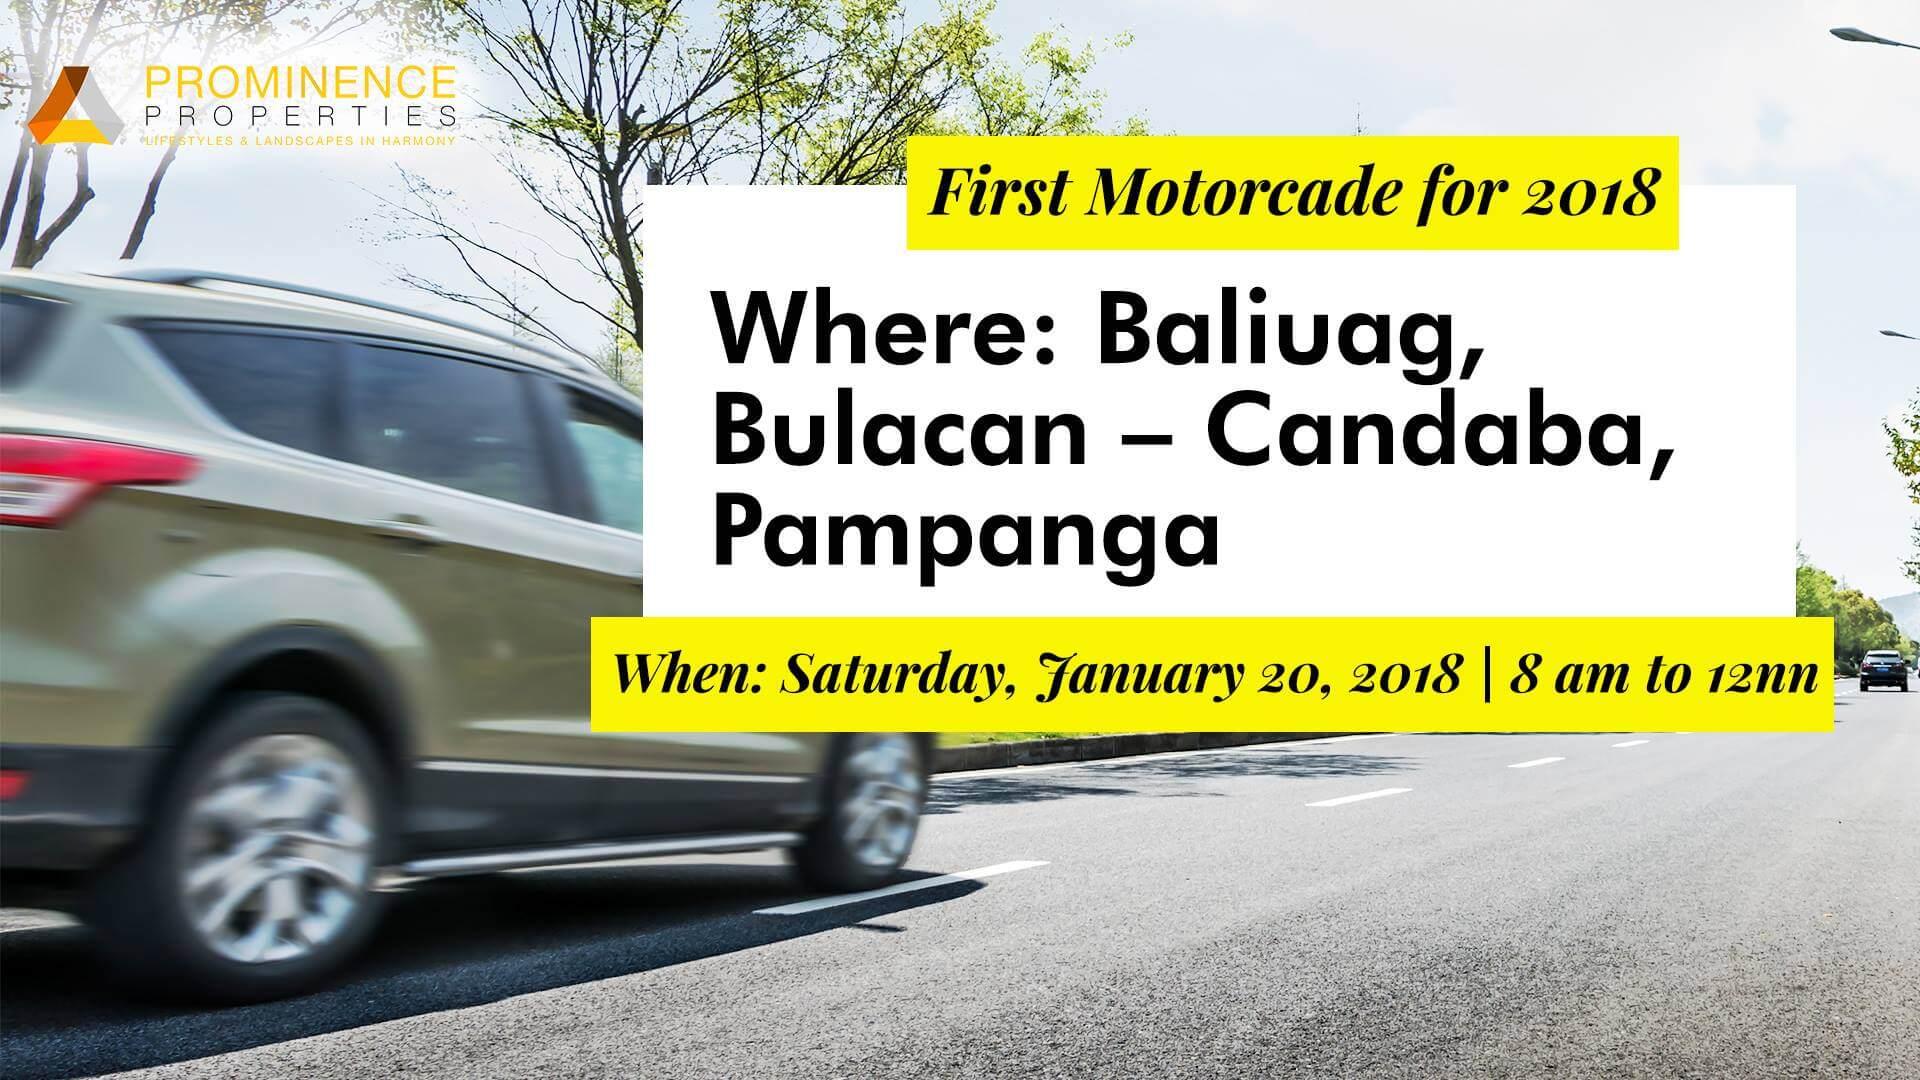 First Motorcade for 2018 (Baliuag-Candaba)